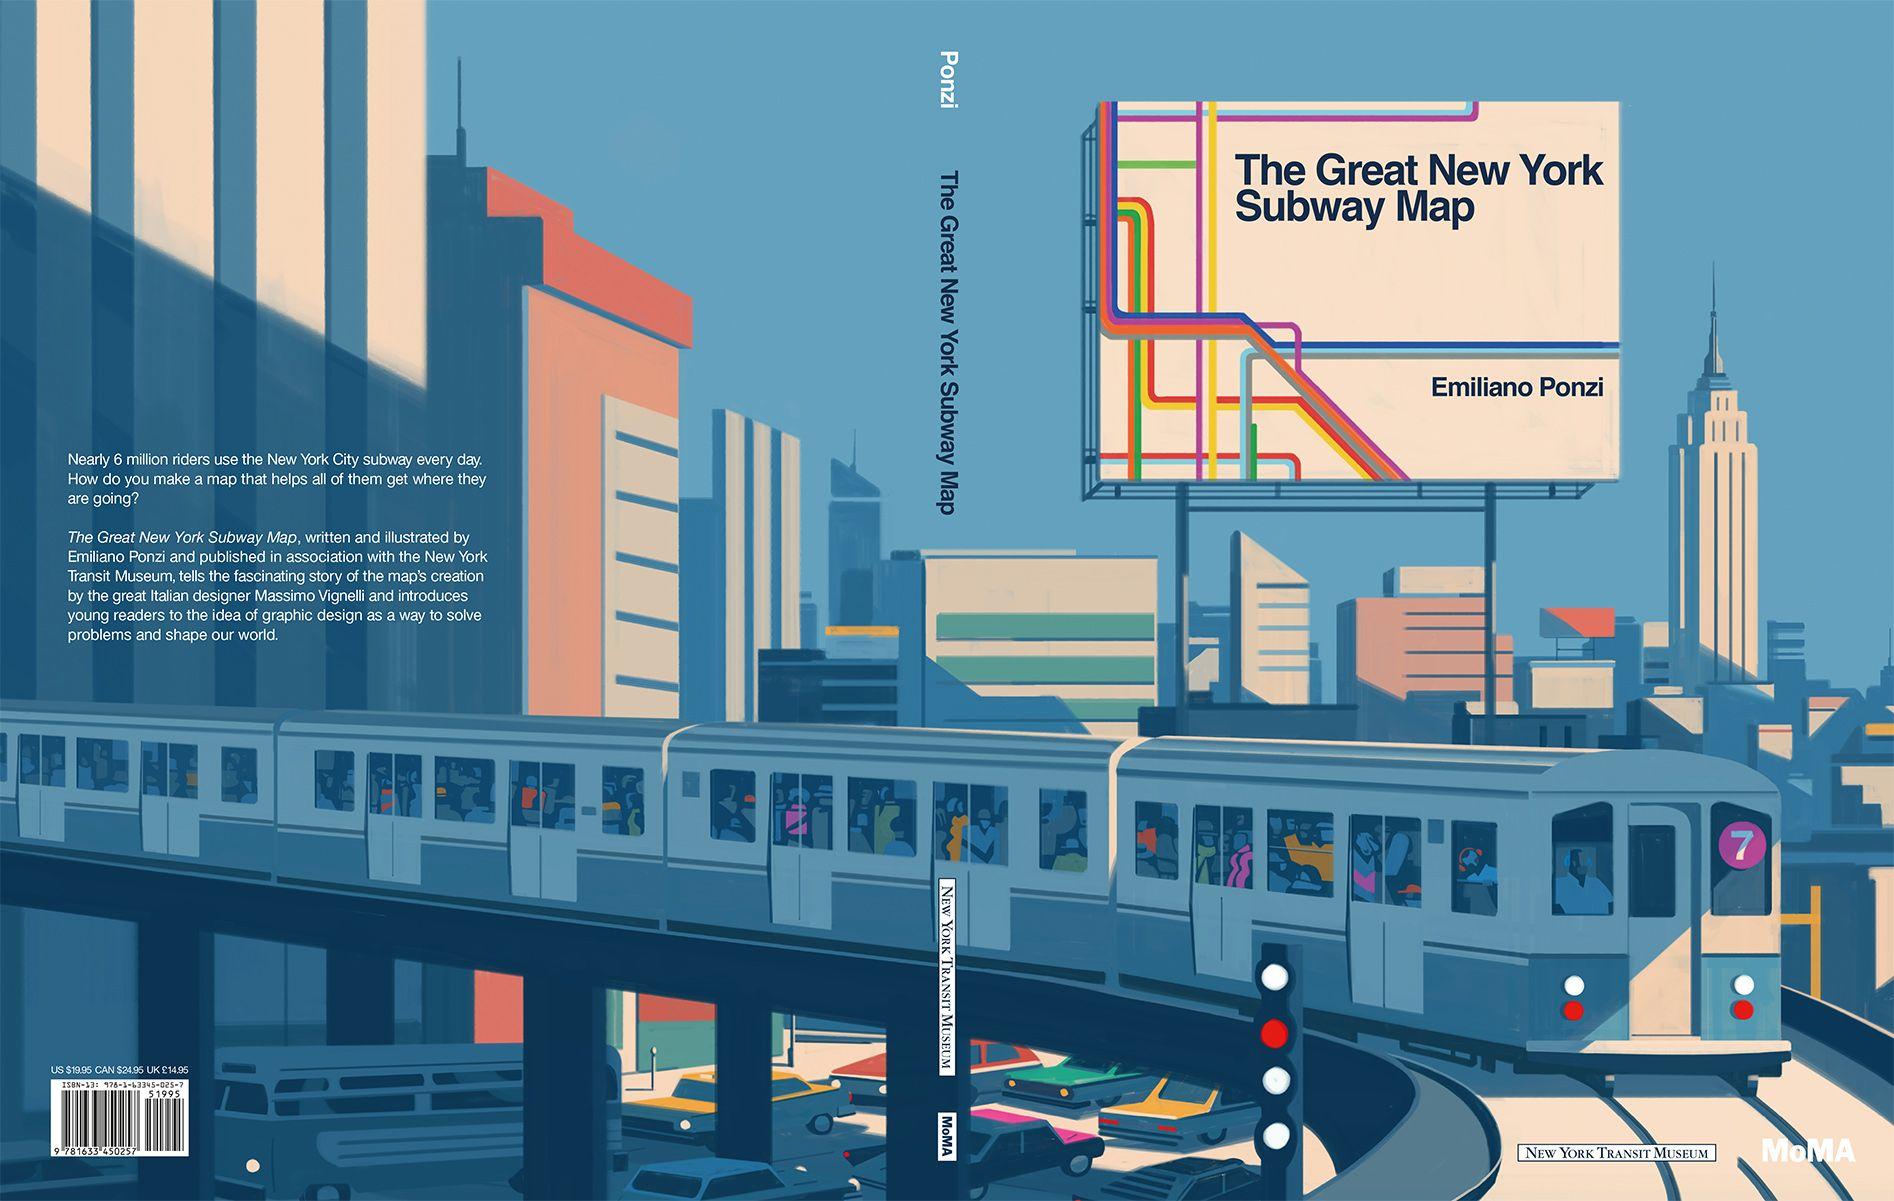 Pin By Jeffrey Heiman On Illustration Inspo Train Illustration Subway Map Design Ny Subway